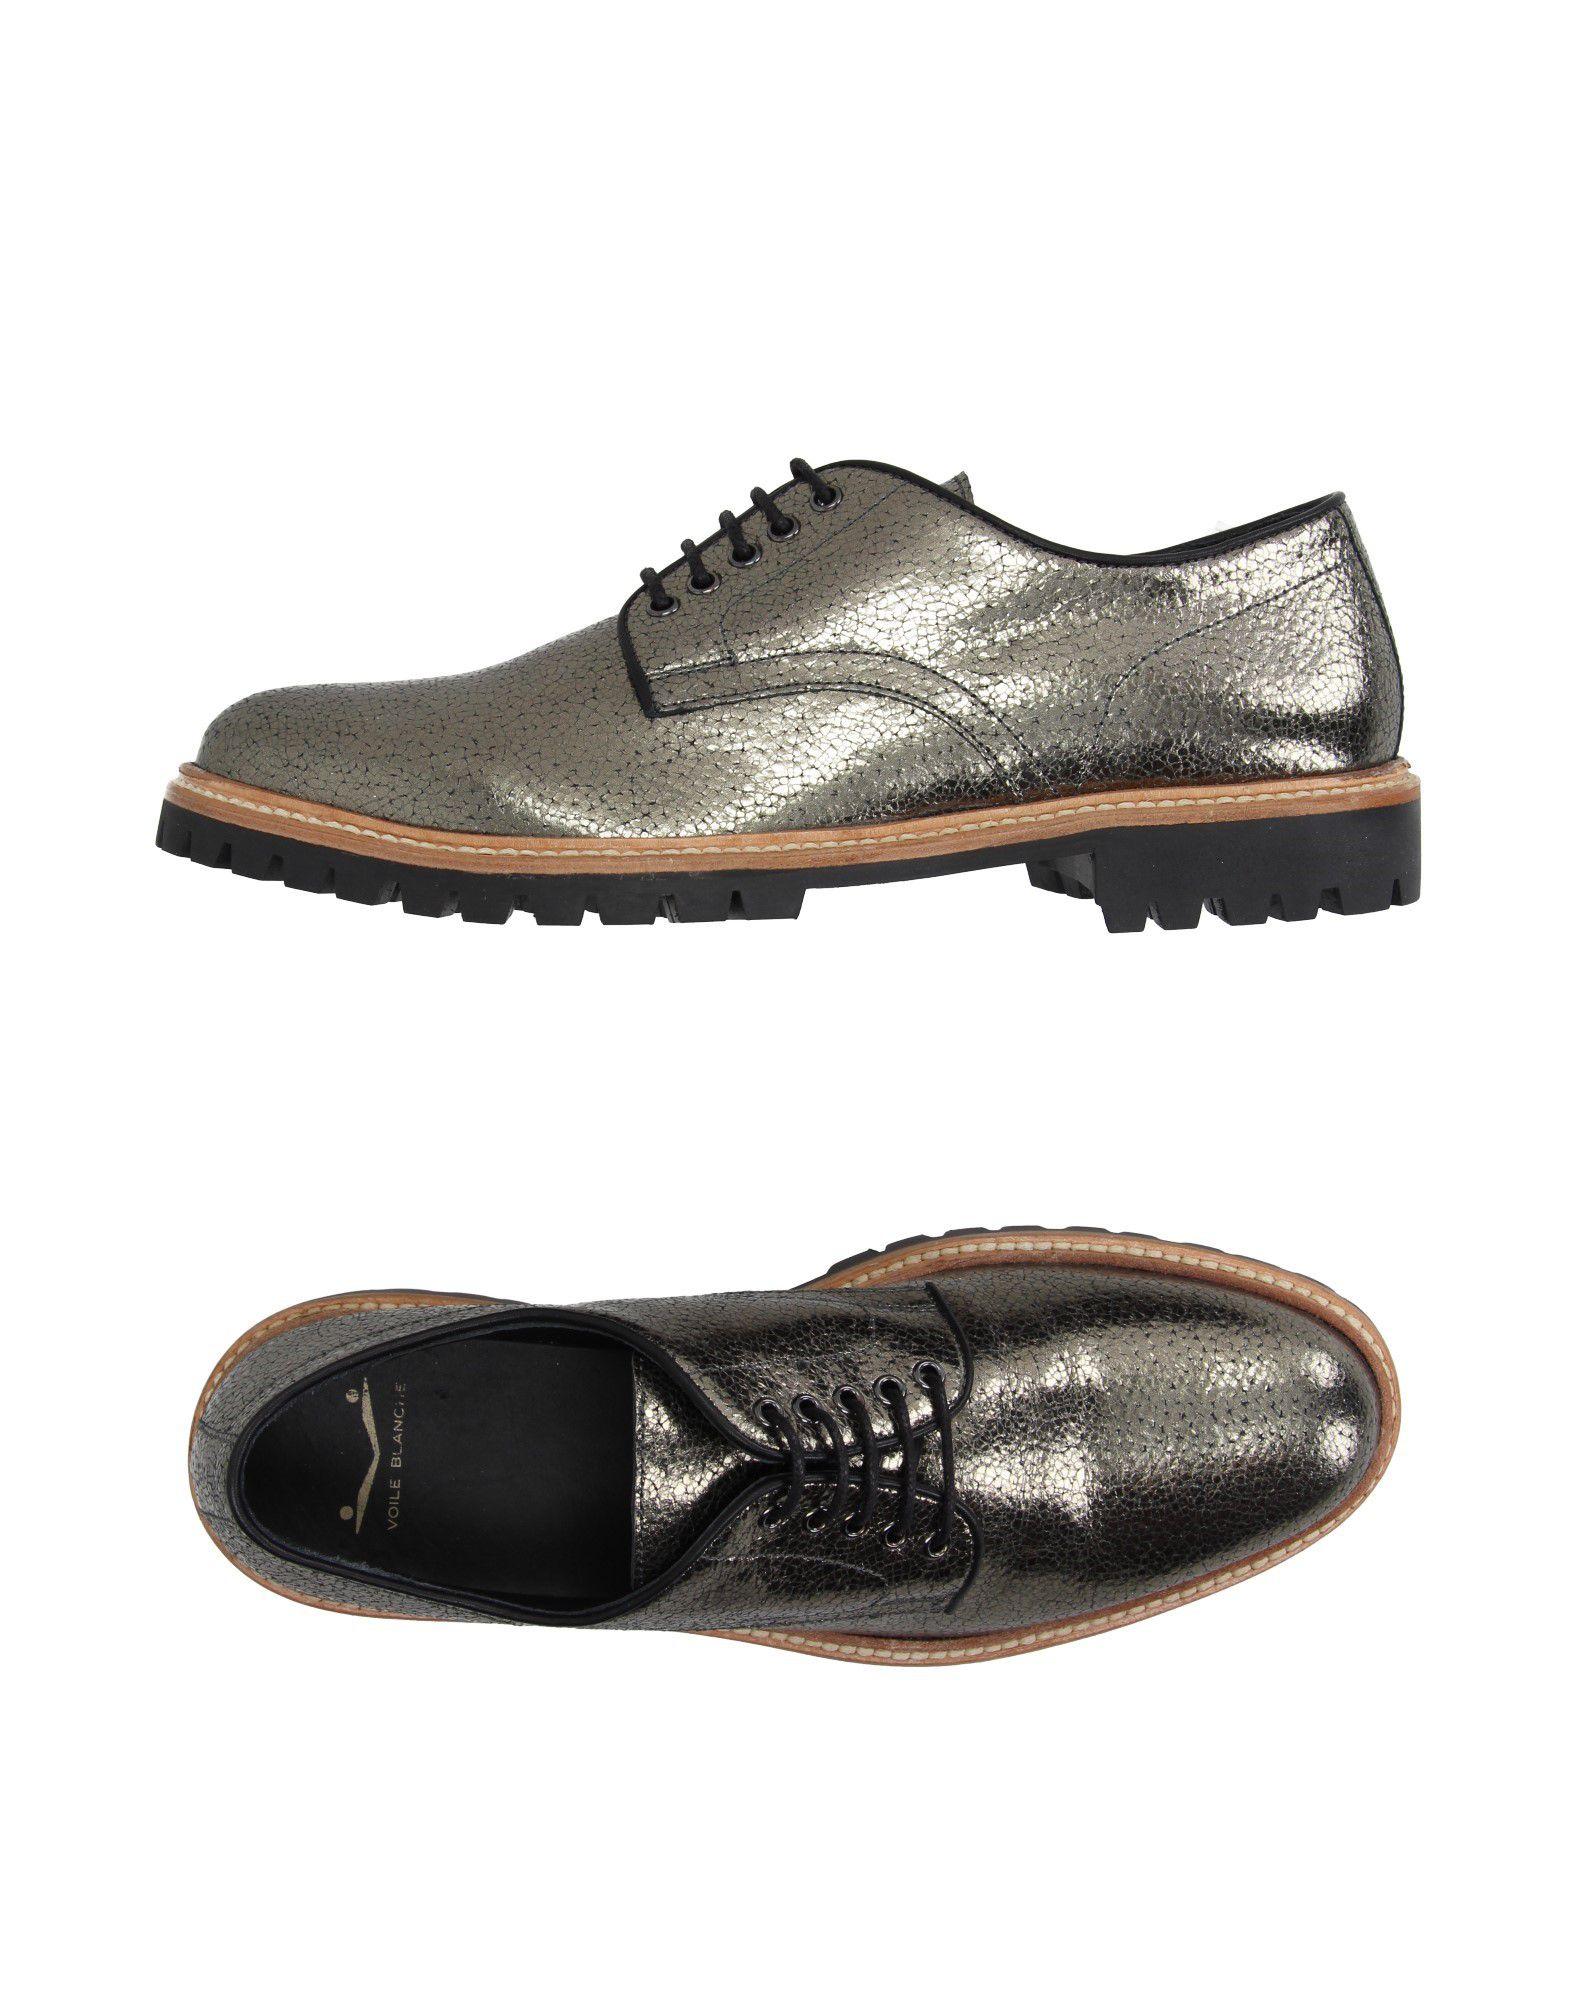 Gut um Schnürschuhe billige Schuhe zu tragenVoile Blanche Schnürschuhe um Damen  11025581WT 8121e7